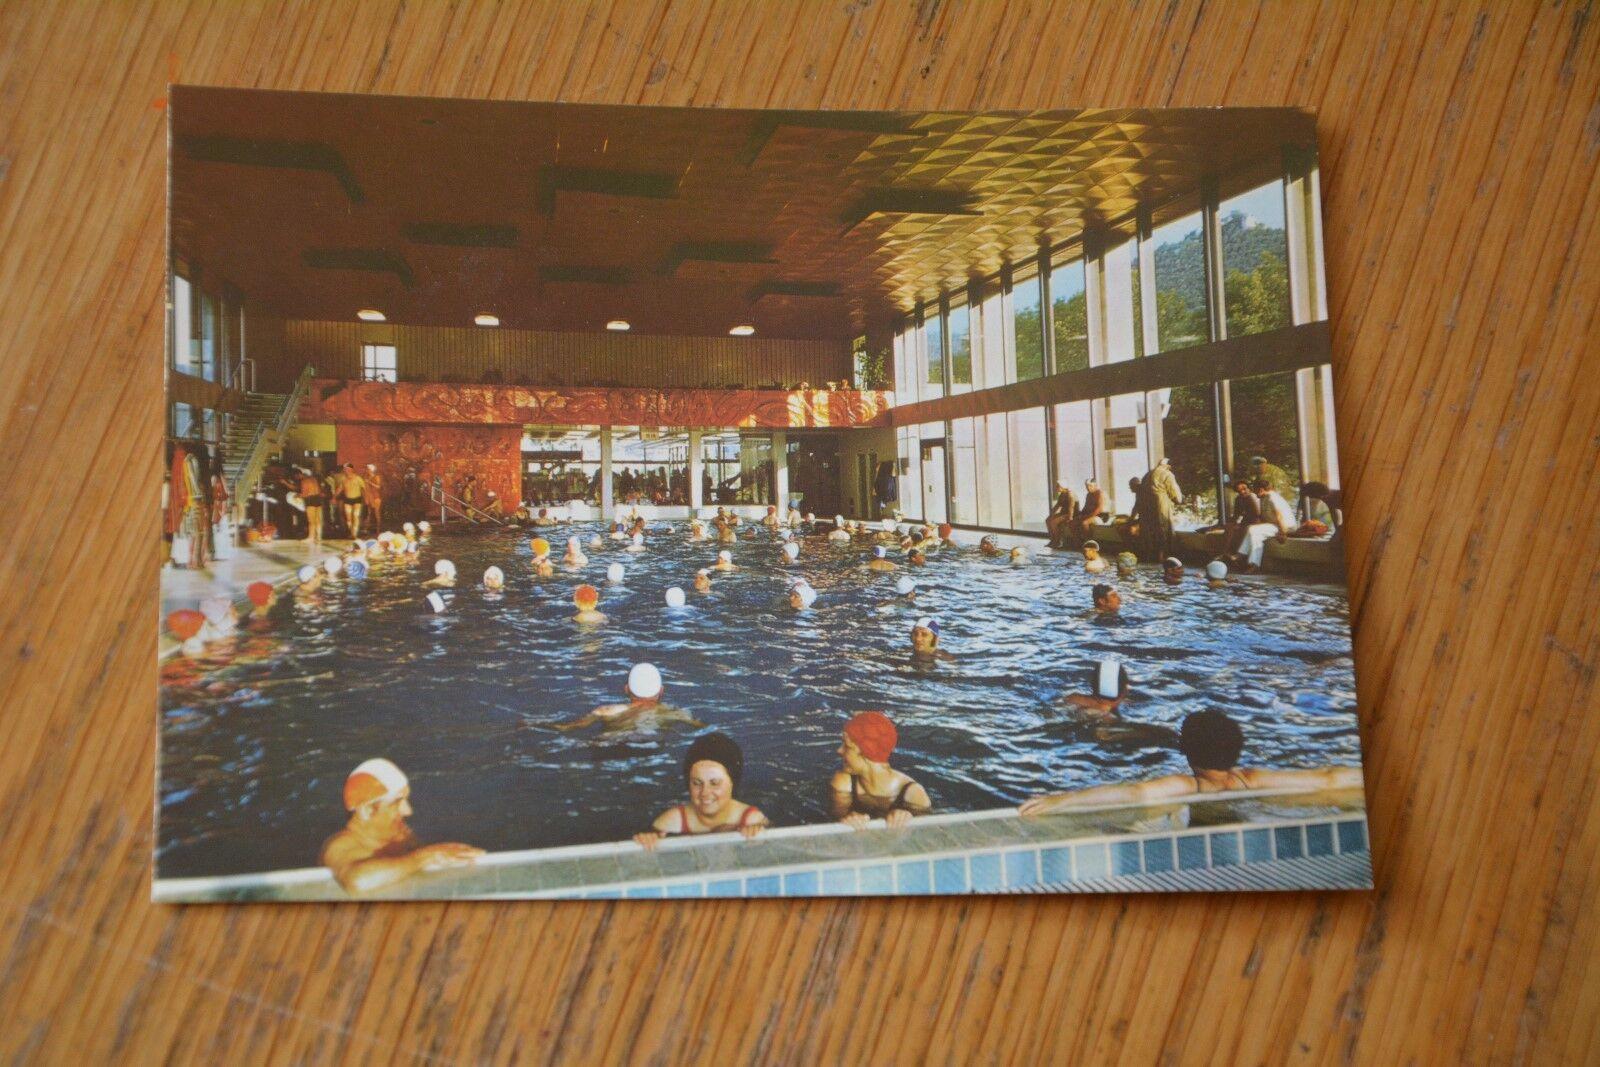 Bad Urach thermalbad